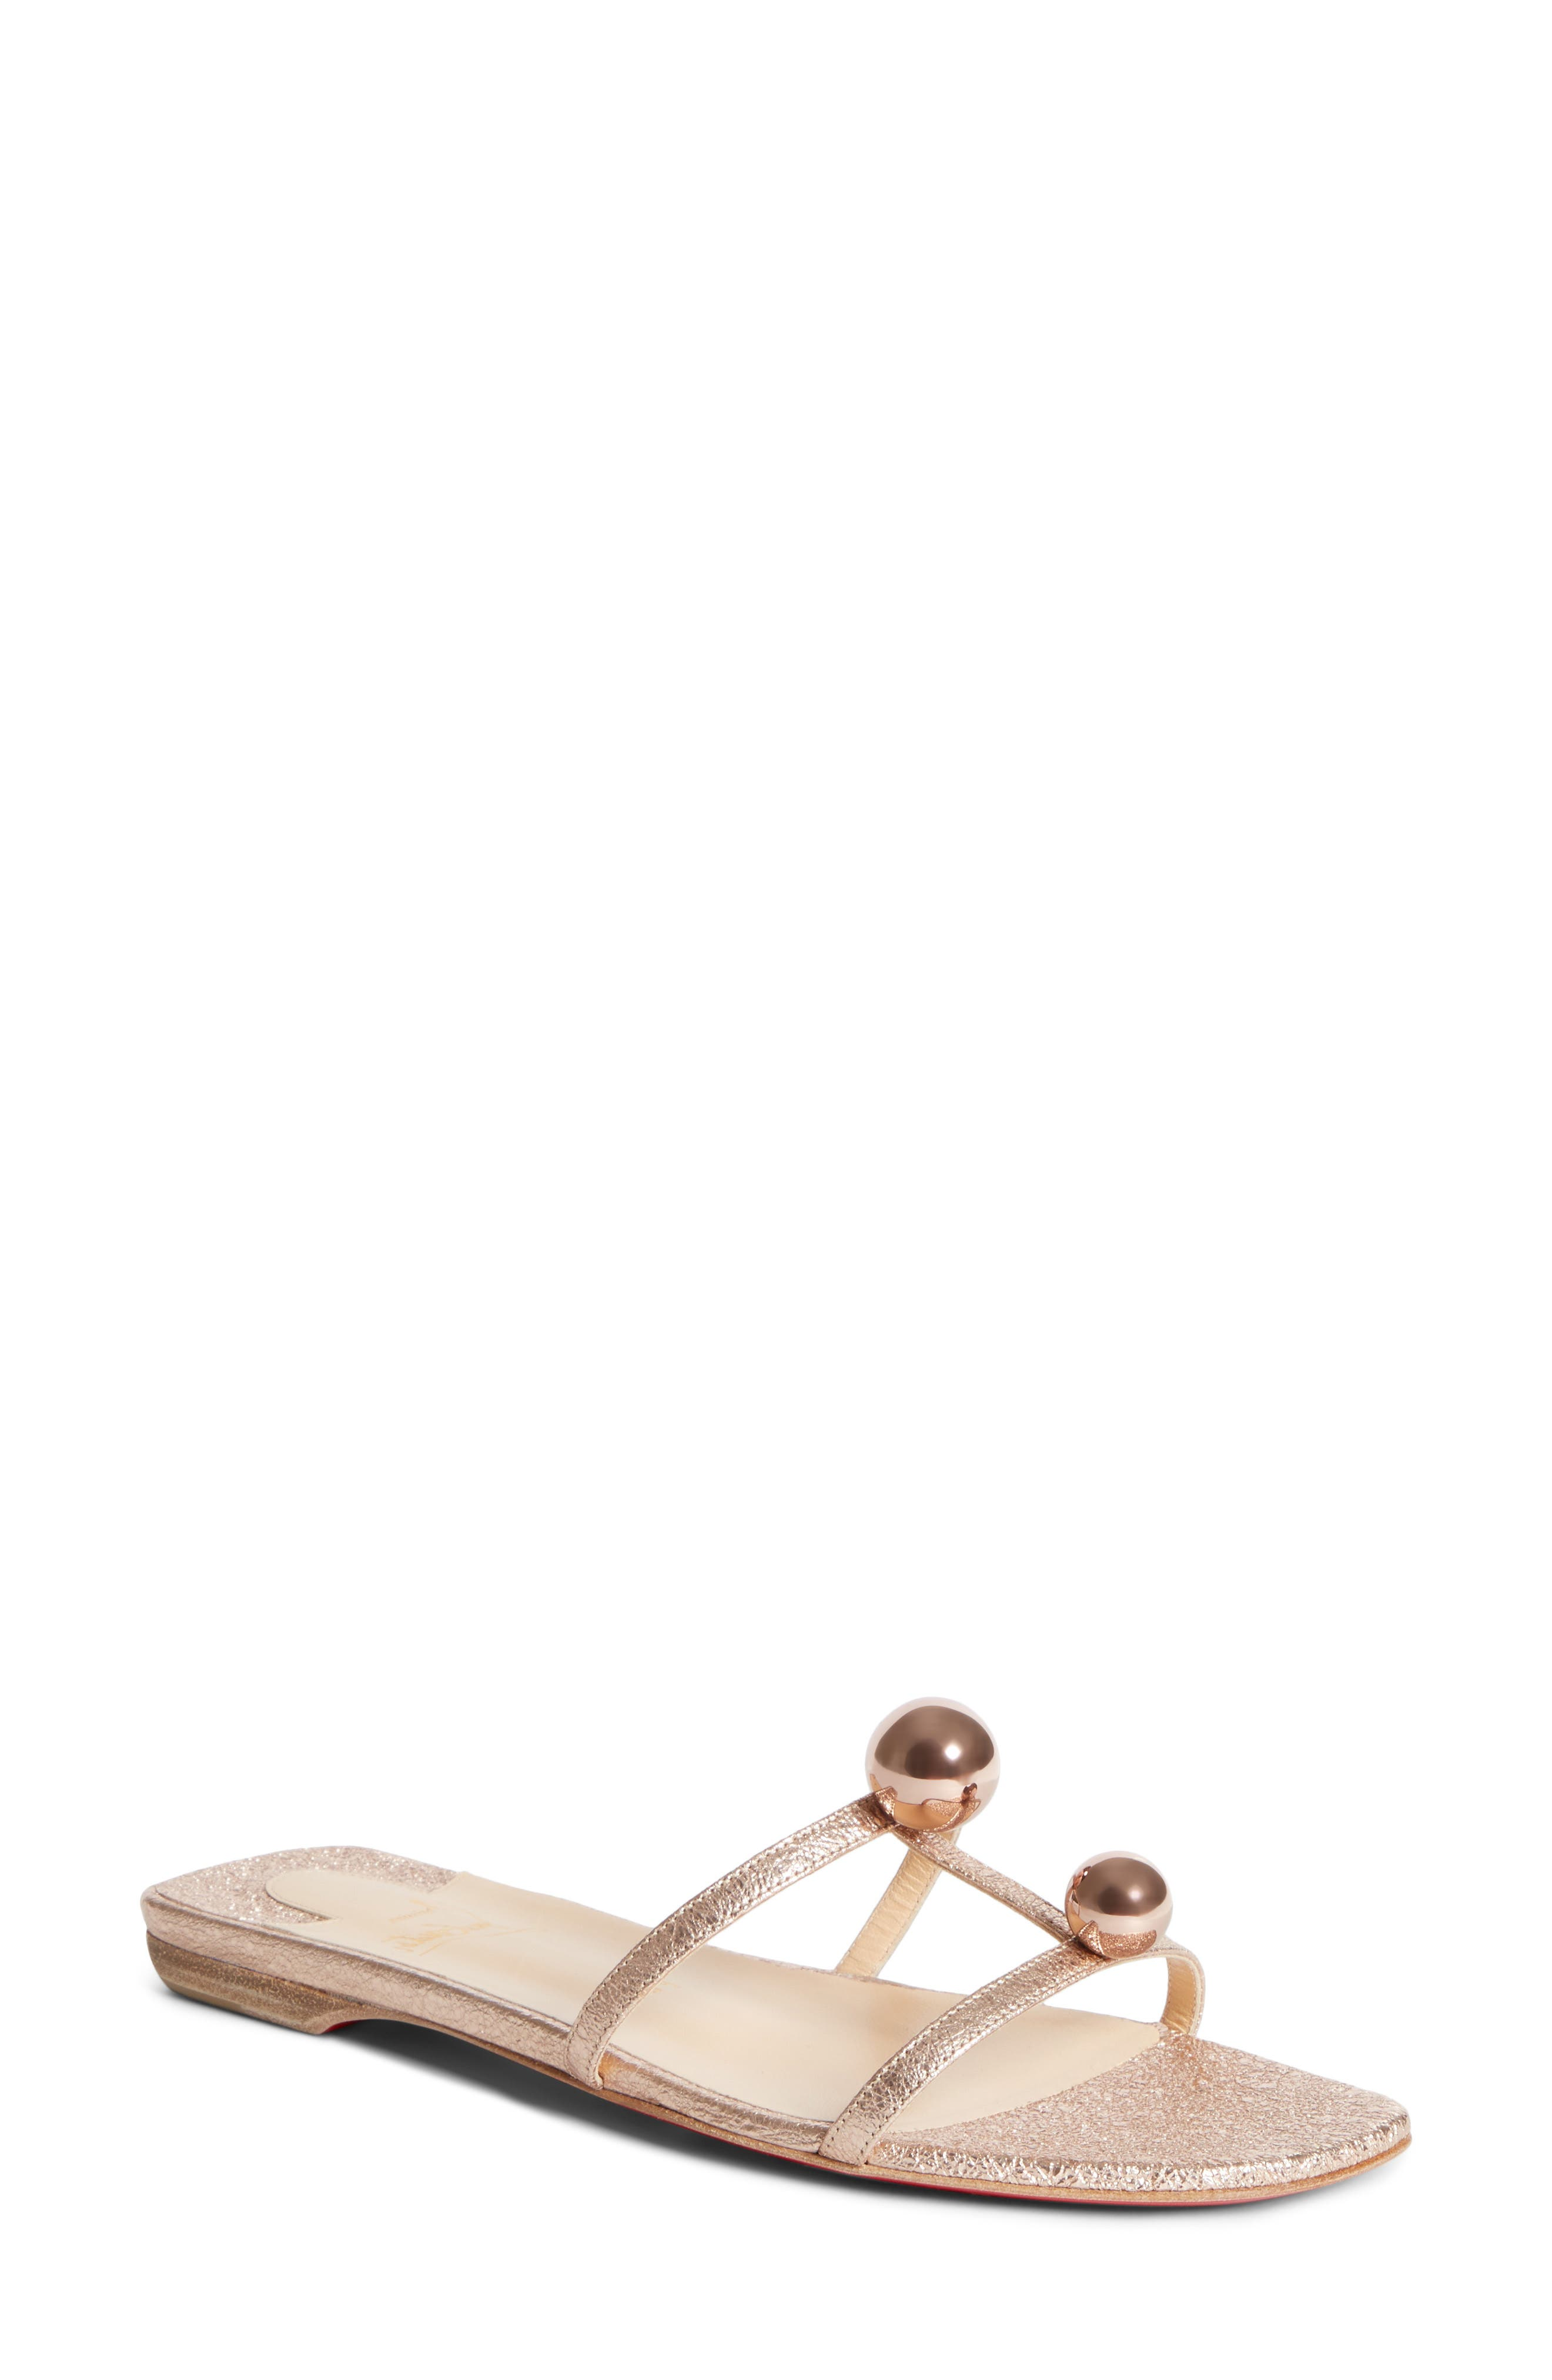 Main Image - Christian Louboutin Atonetta Ornament Slide Sandal (Women)